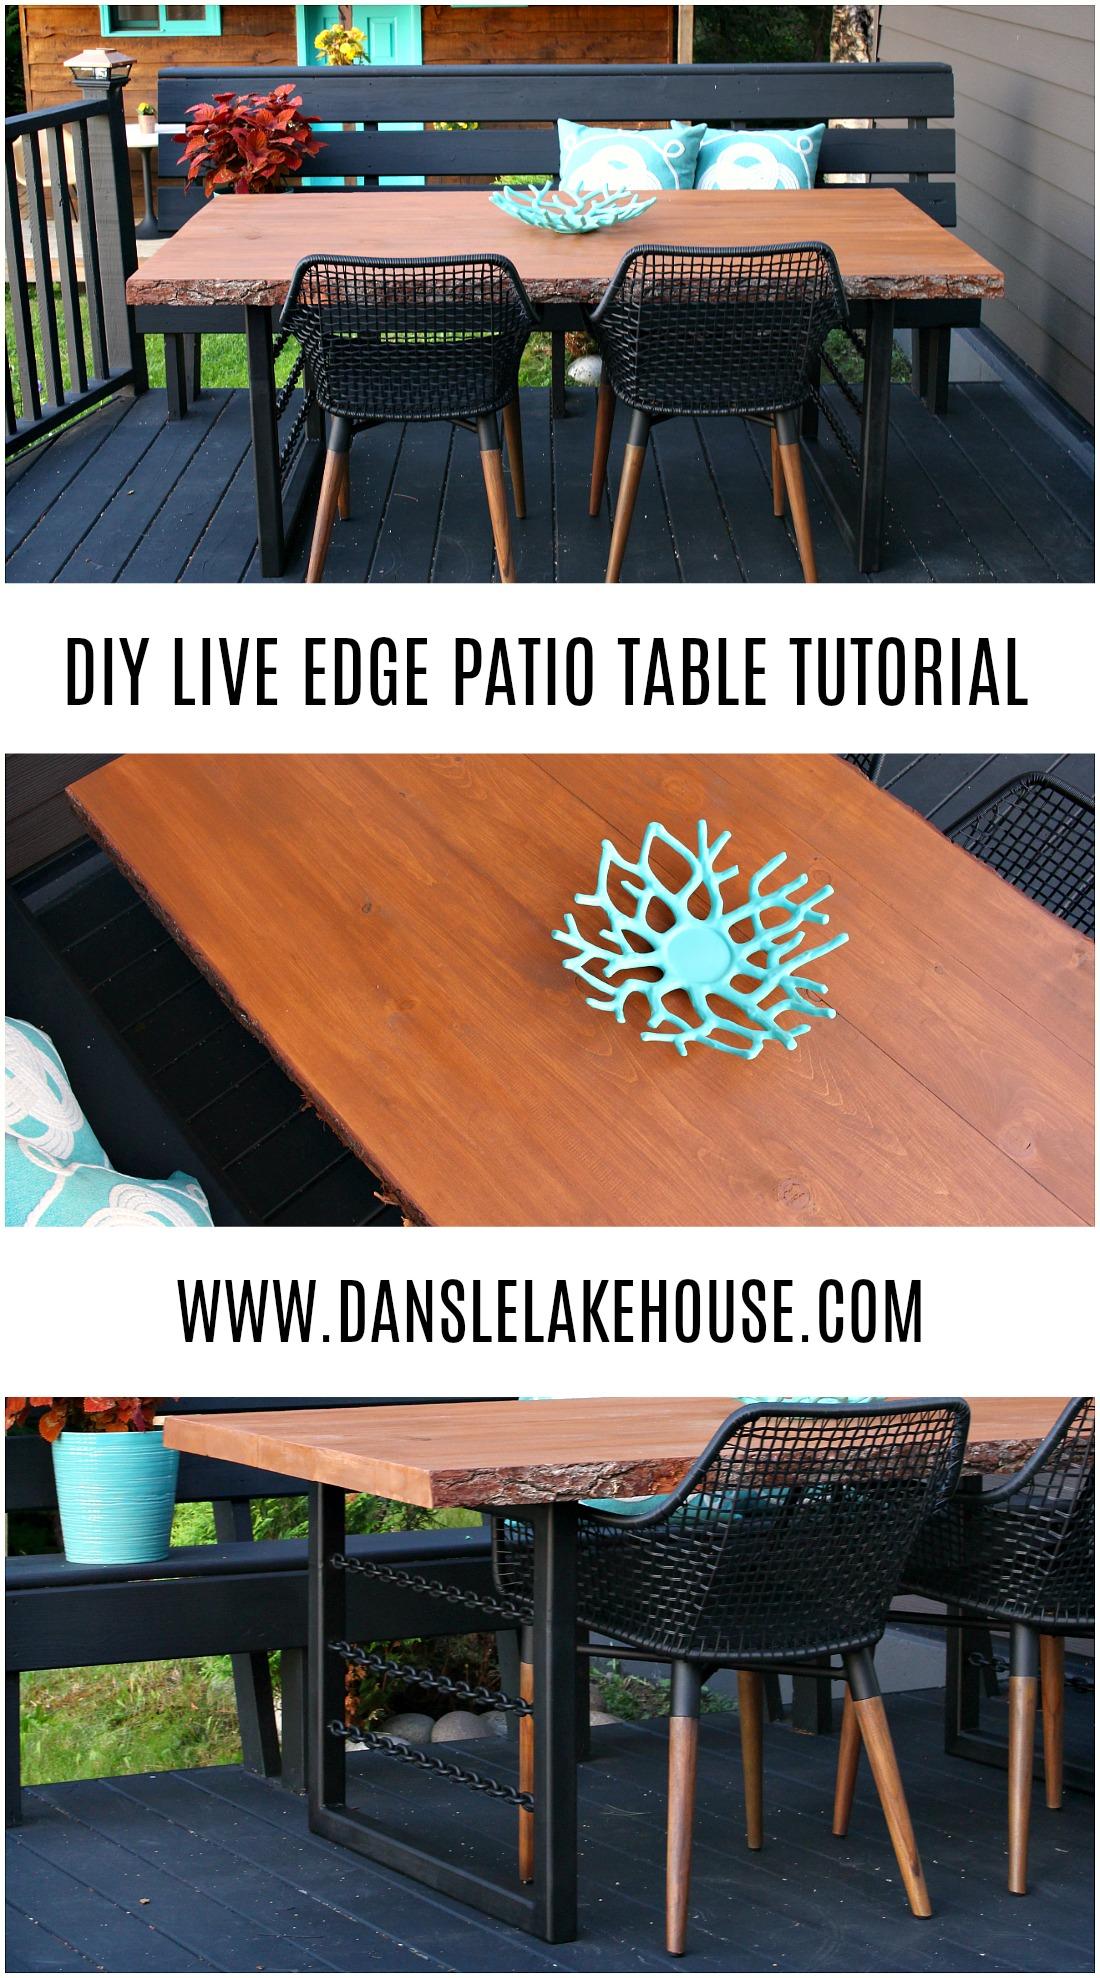 DIY Live Edge Patio Table Tutorial